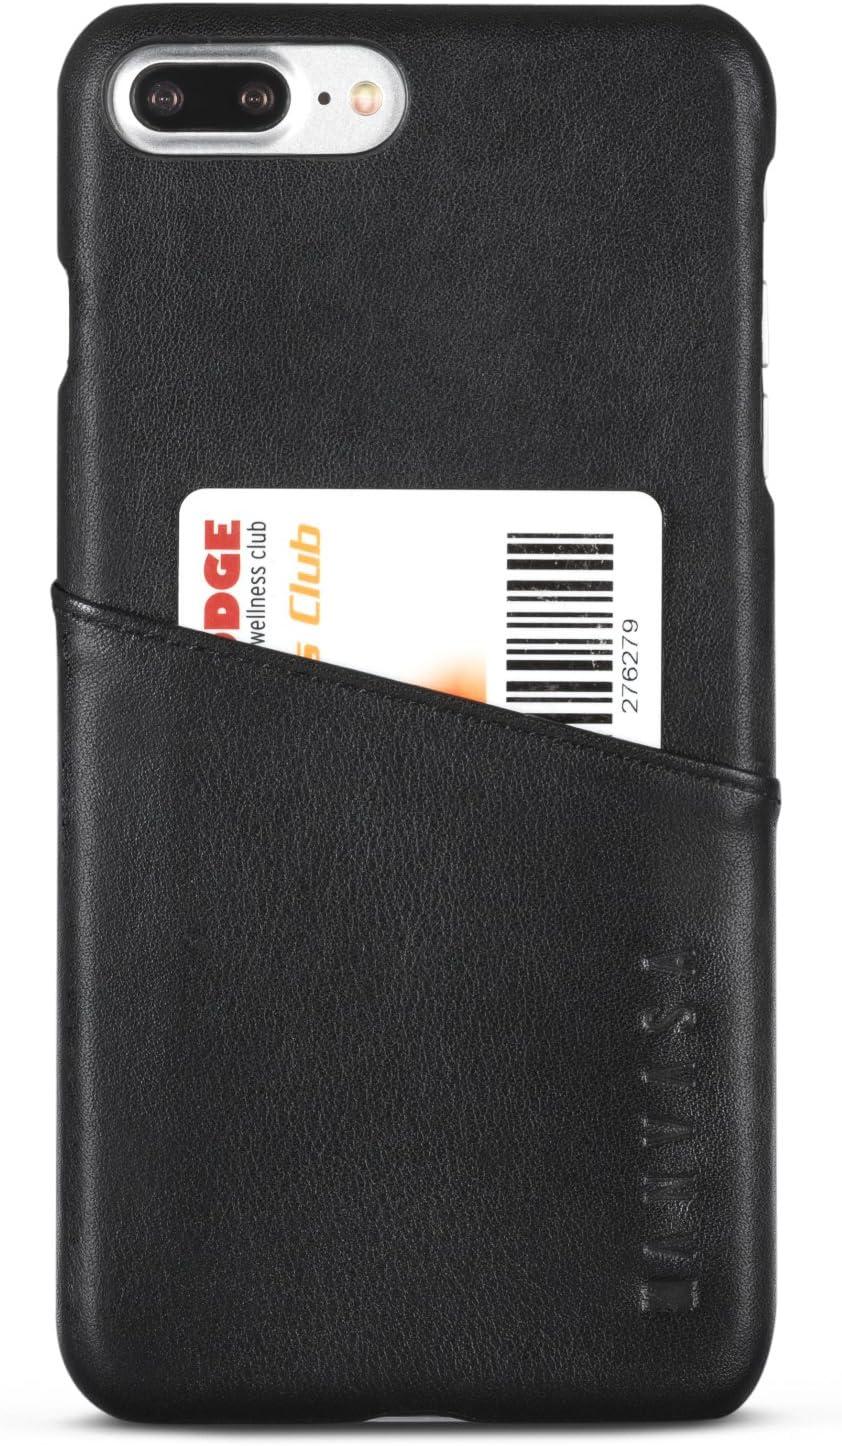 iPhone 8 Plus Leather Case/iPhone 7 Plus Leather Case Black - KANVASA Cards Premium Genuine Leather Wallet Back Cover for The Original iPhone 8 Plus & 7 Plus (5.5